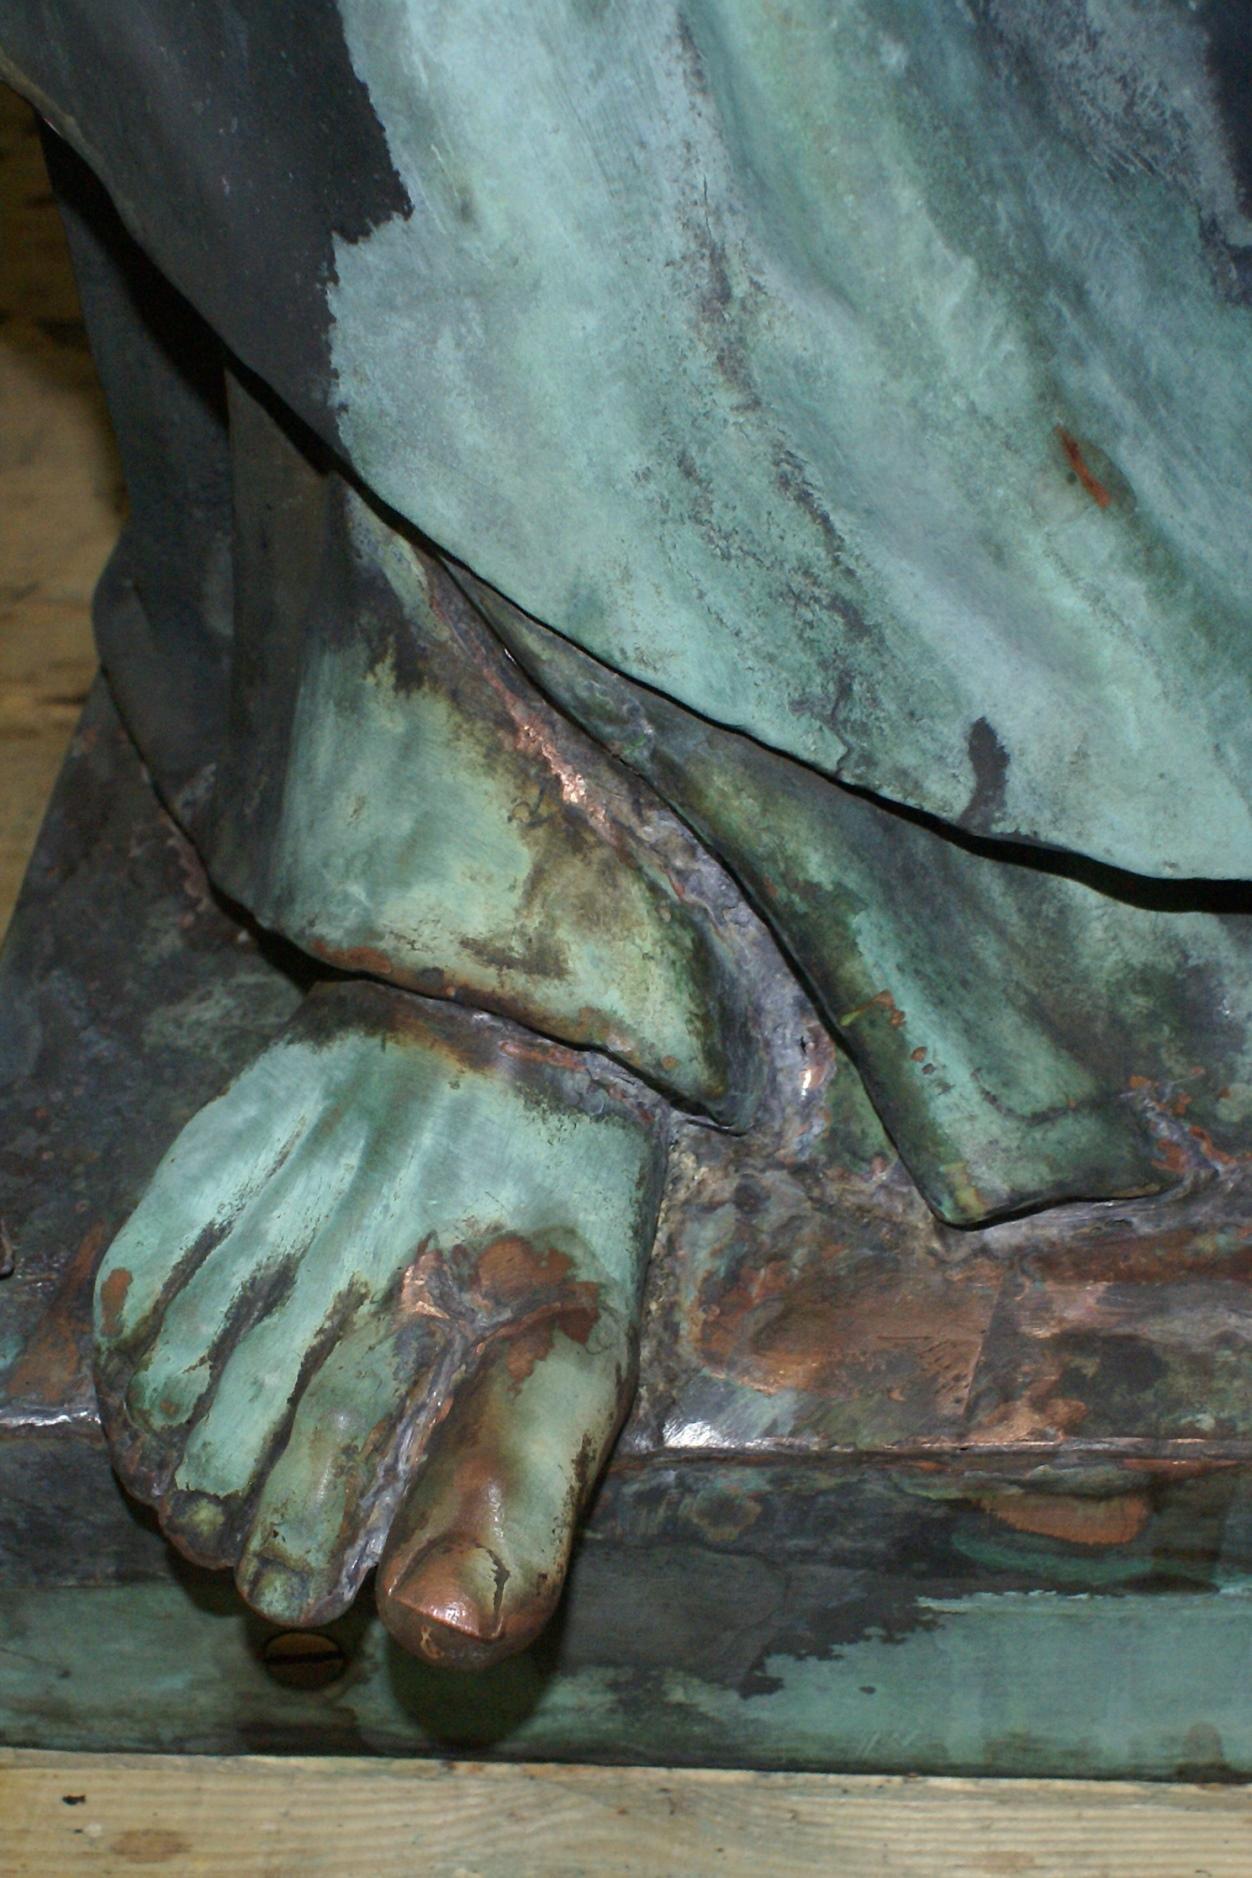 Detailansicht rechter Fuß: Fehlstellen und Risse materialgerecht geschlossen